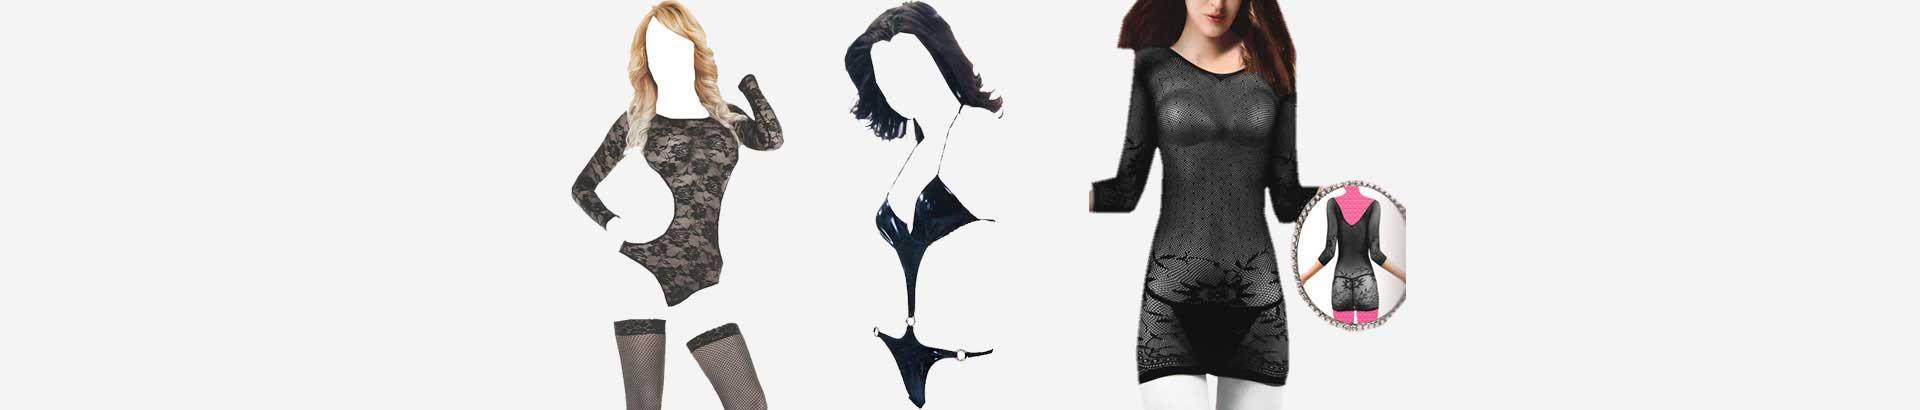 لباس بادی